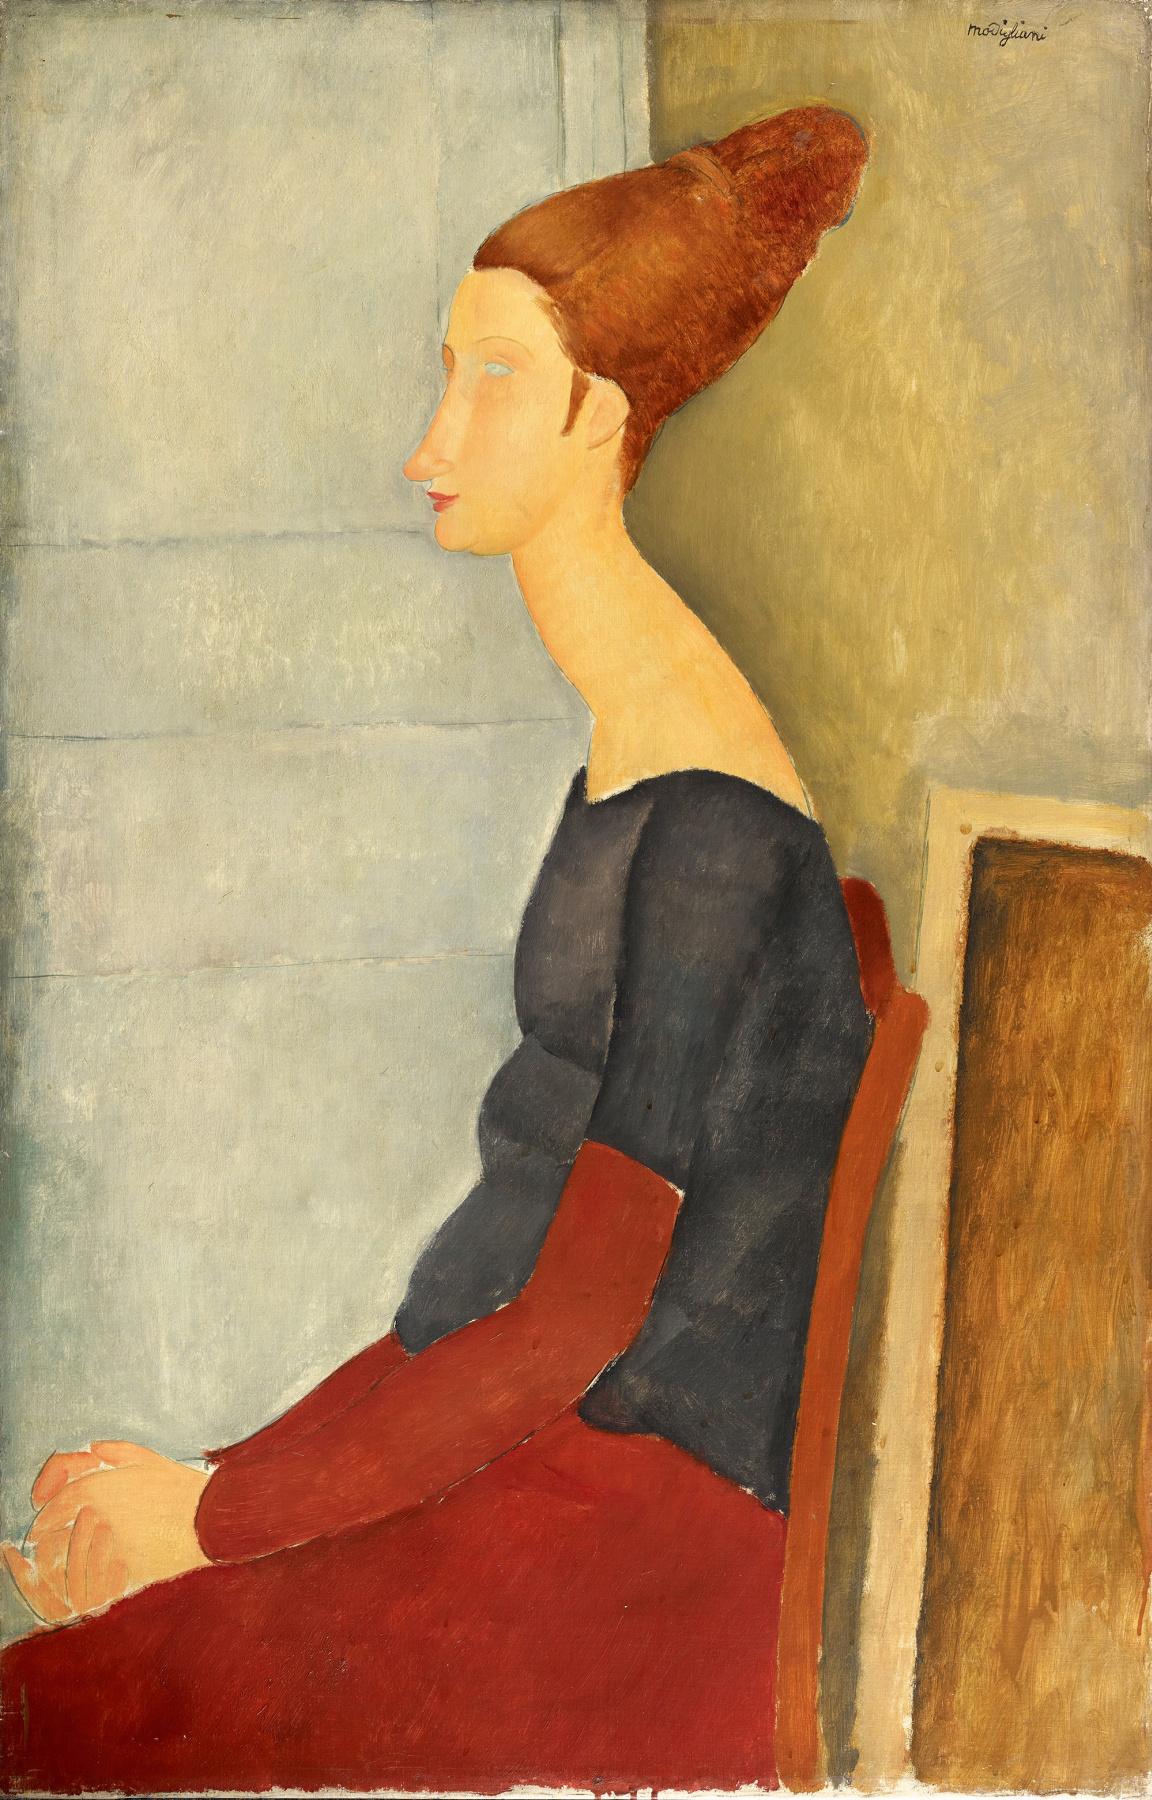 Amedeo Modigliani. Seated portrait of Jeanne hebuterne in profile (in dark clothes)